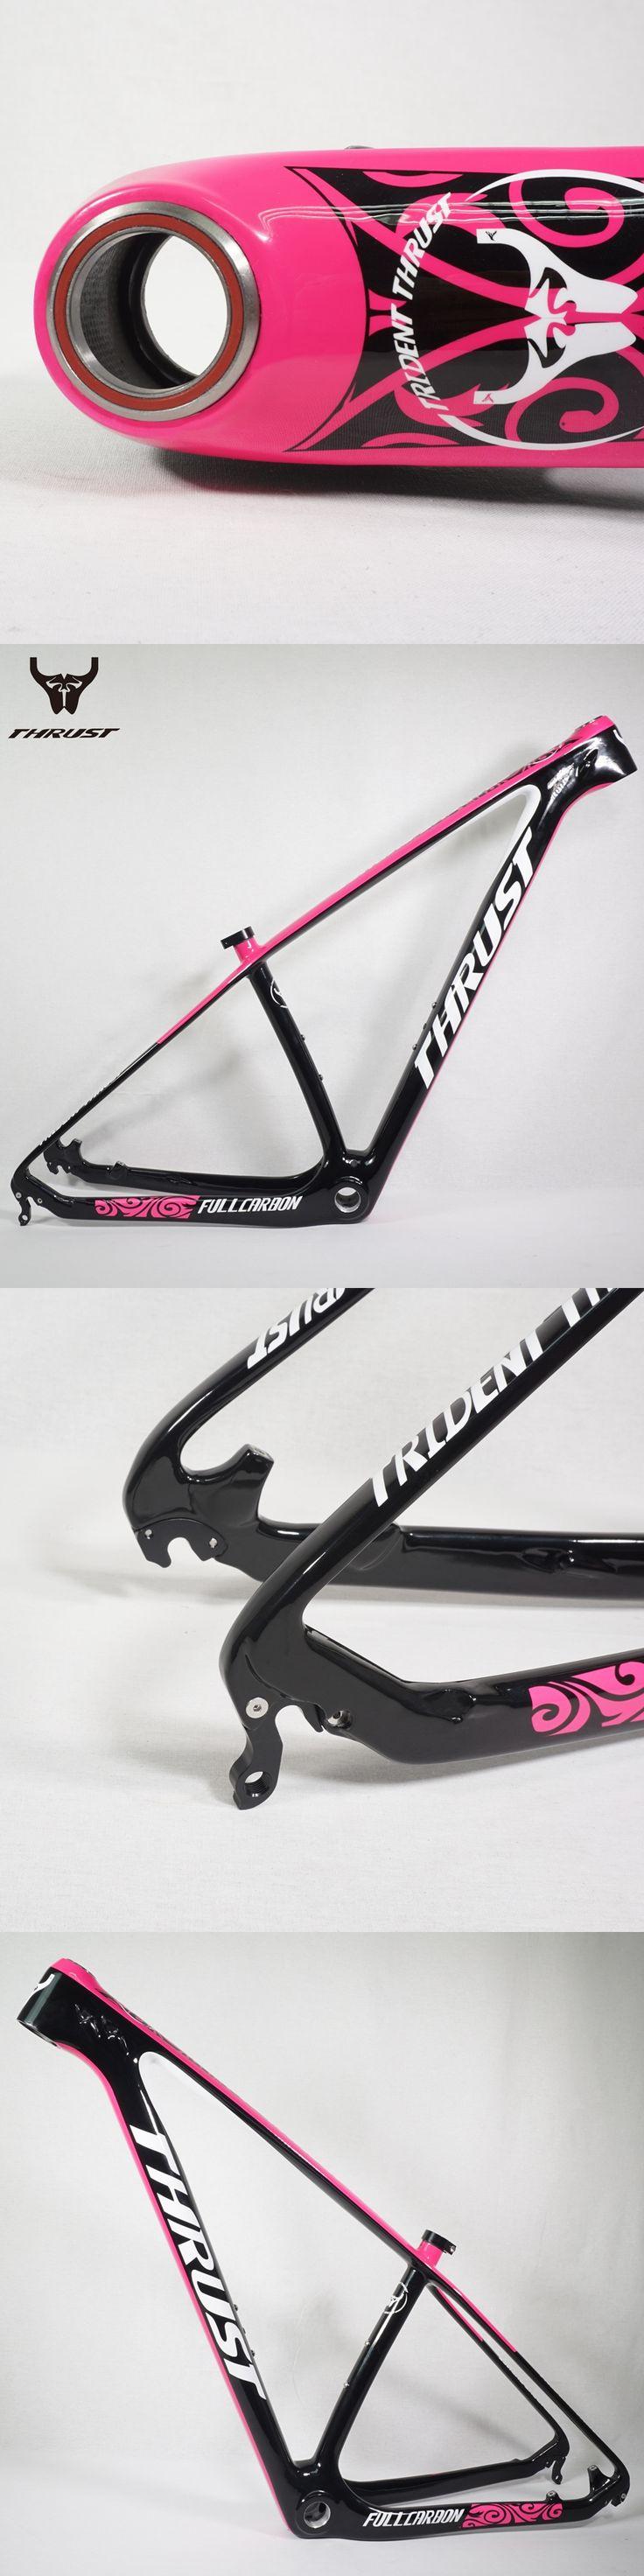 "THRUST Full Carbon Frame MTB Frame 29er 15''/17''/19"" Mountain Bike Bicycle Carbon Frame 29ER"